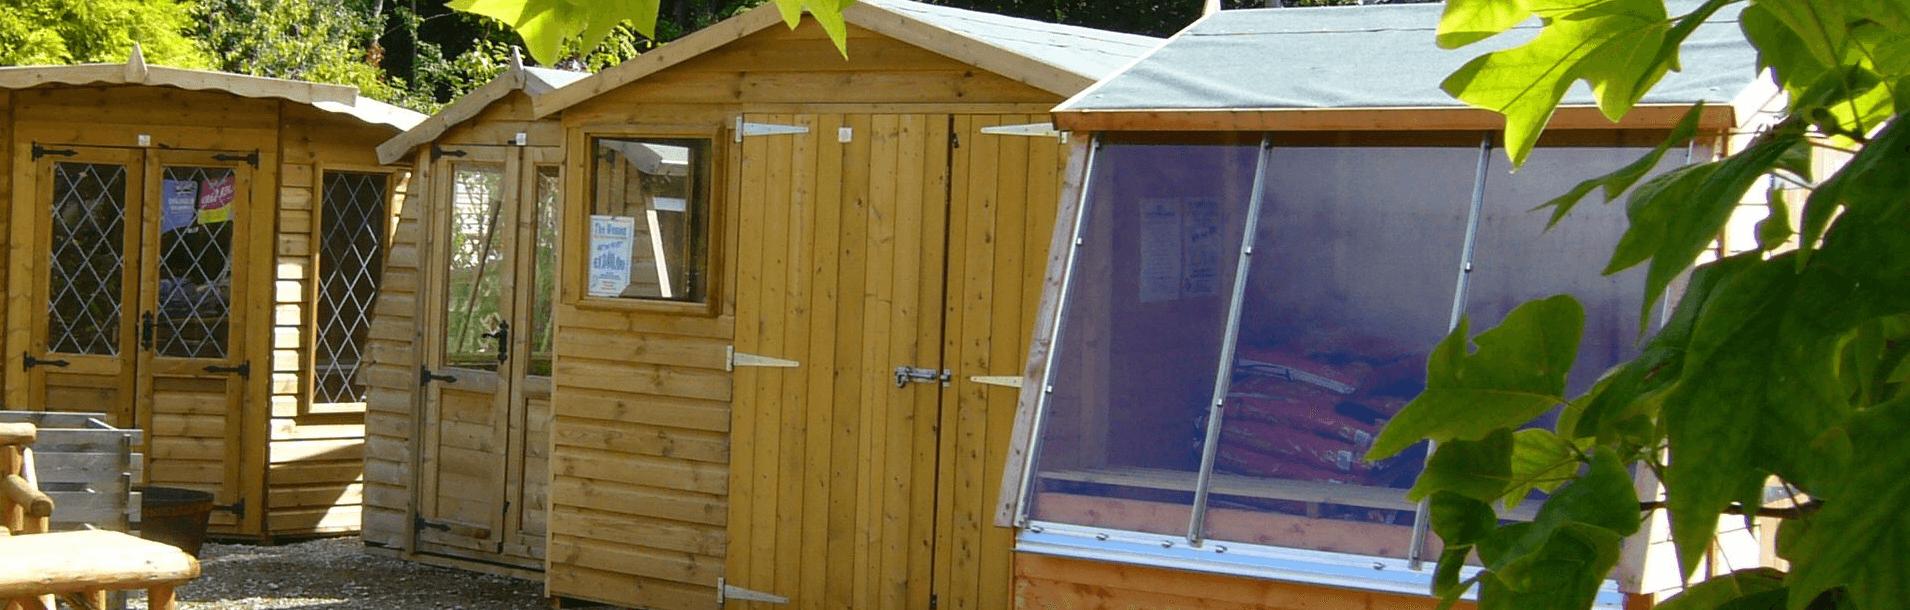 Sheds & Summerhouses from Carr Bank Garden Centre